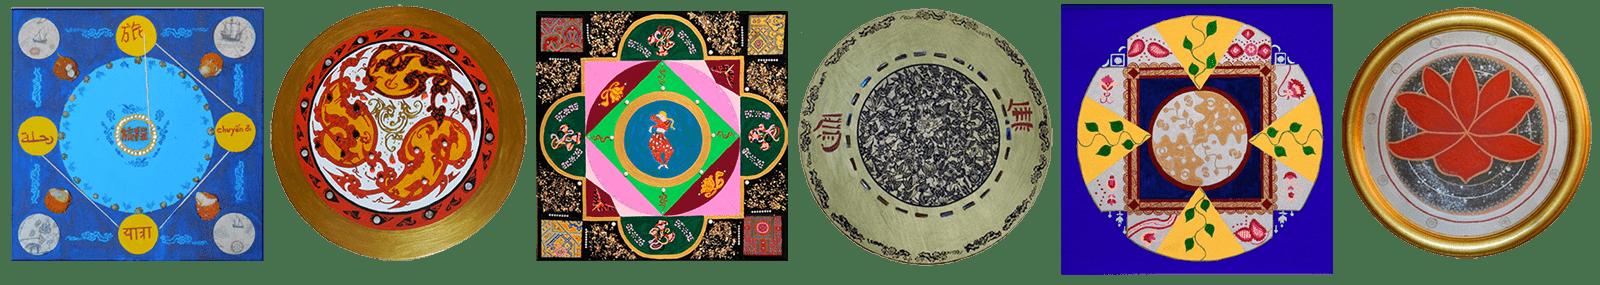 esempi di mandala dipinti da Monica Morganti